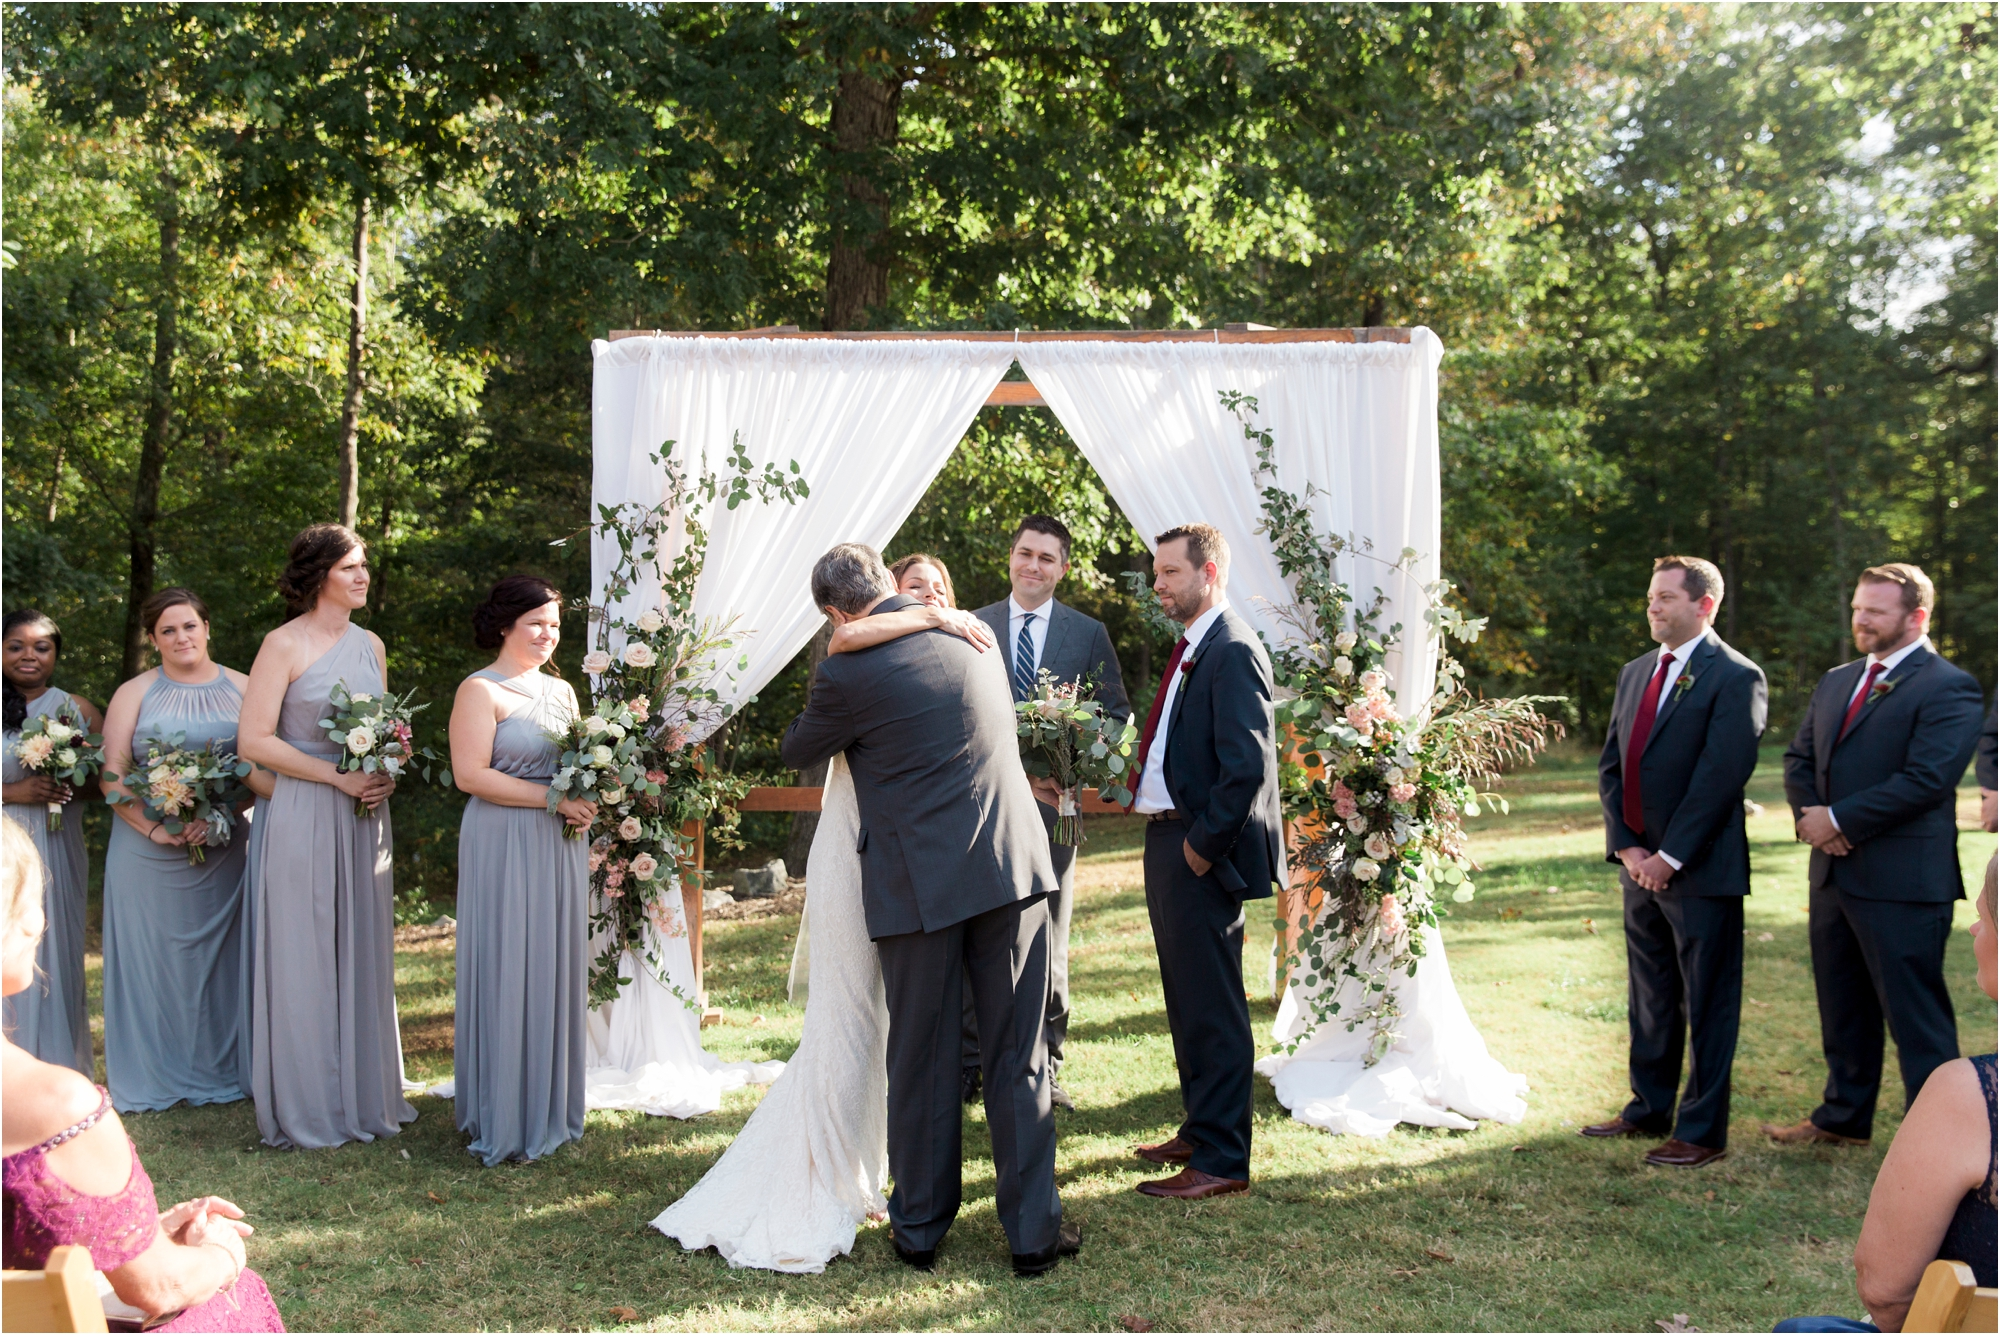 brittany-brad-ashton-creek-vineyard-richmond-virginia-wedding_0019.jpg